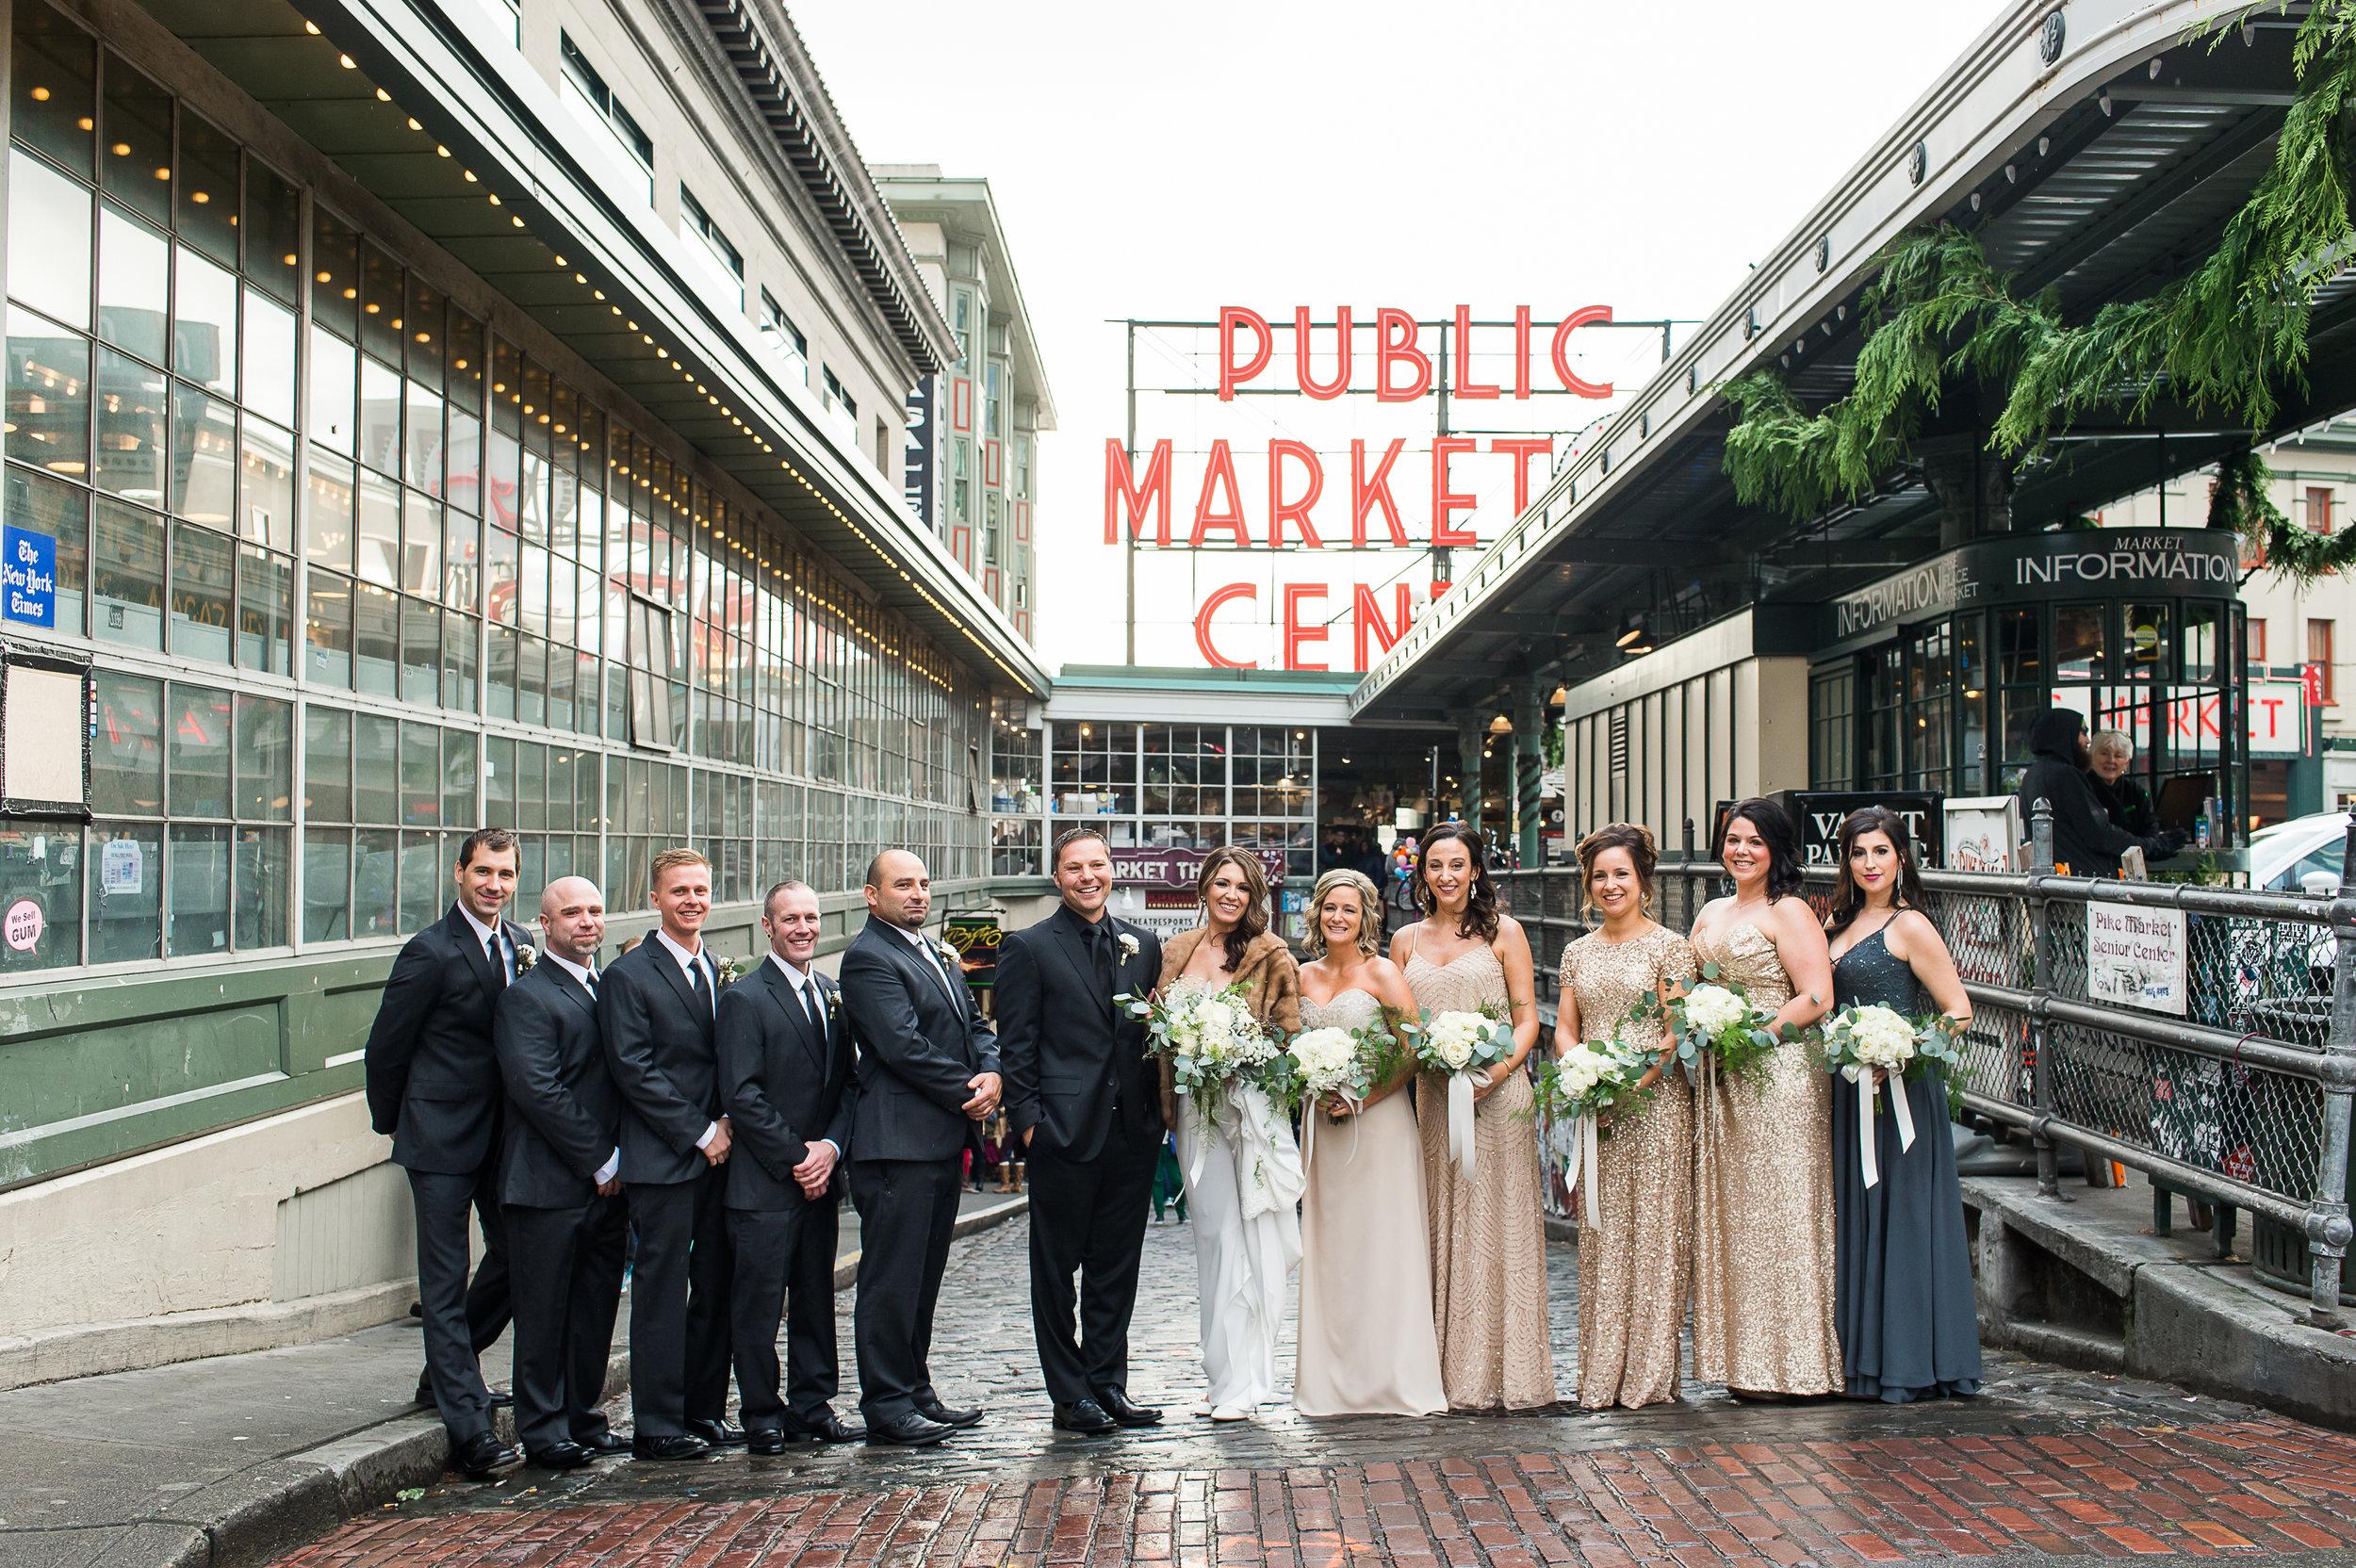 JJ-wedding-Van-Wyhe-Photography-147.jpg